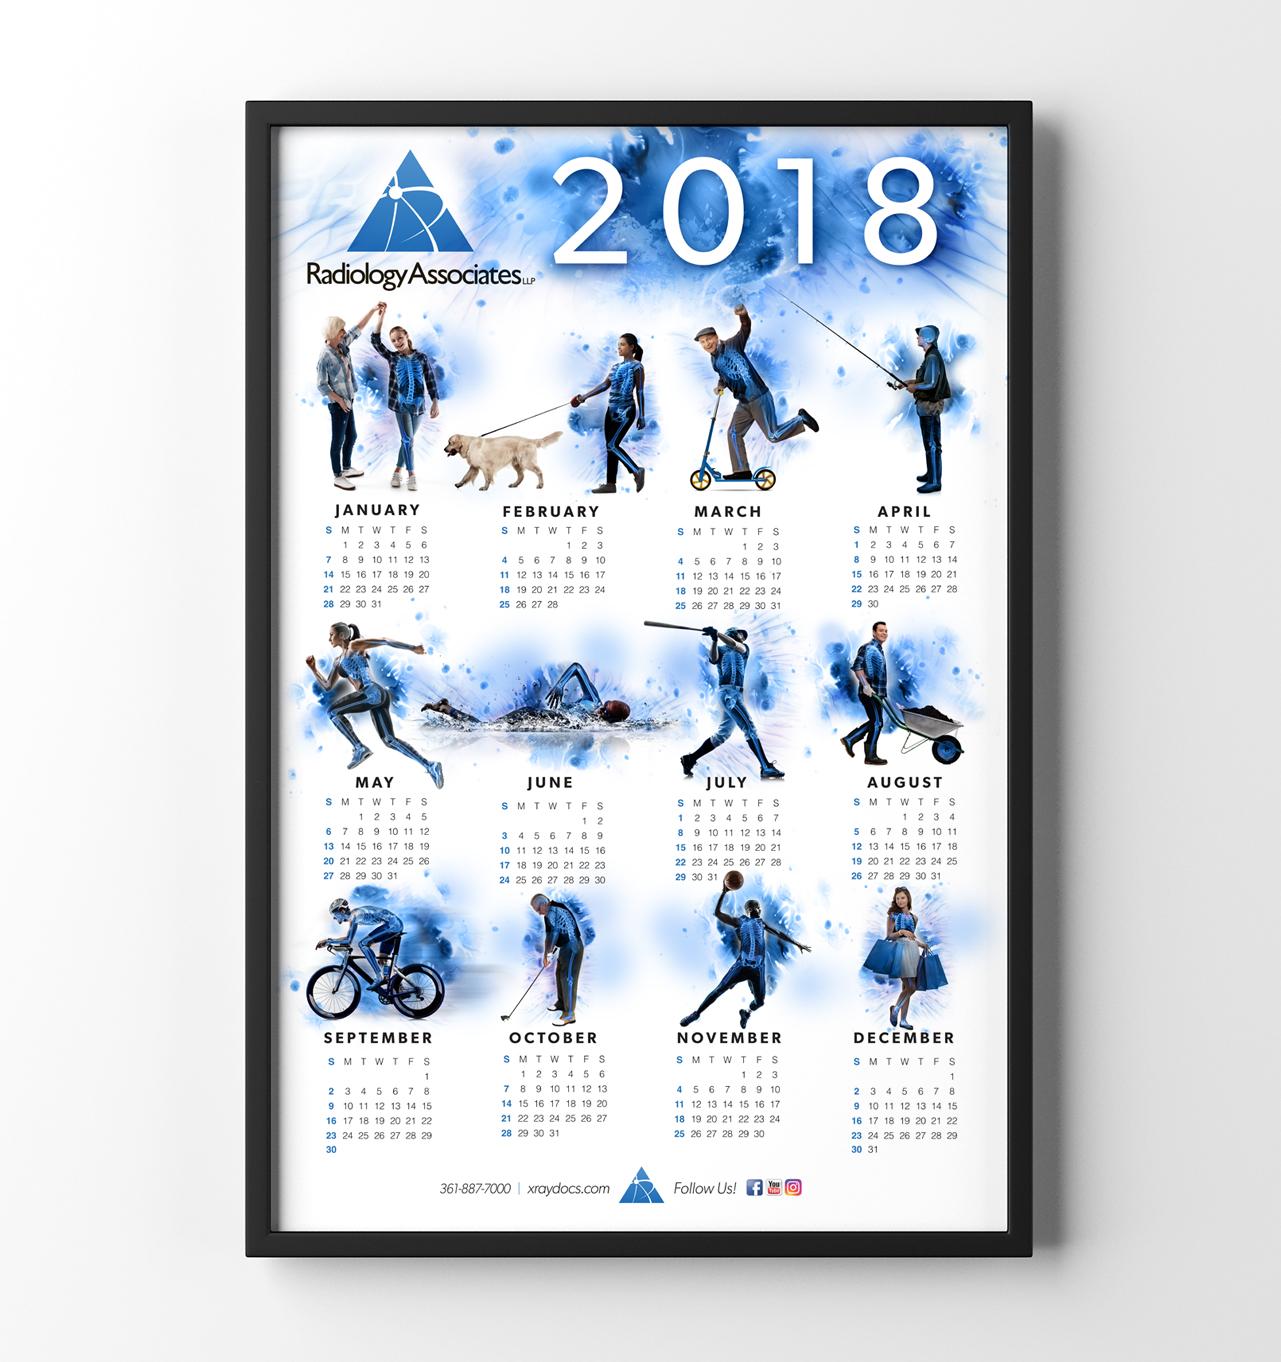 Radiology Associates Wall Calendar